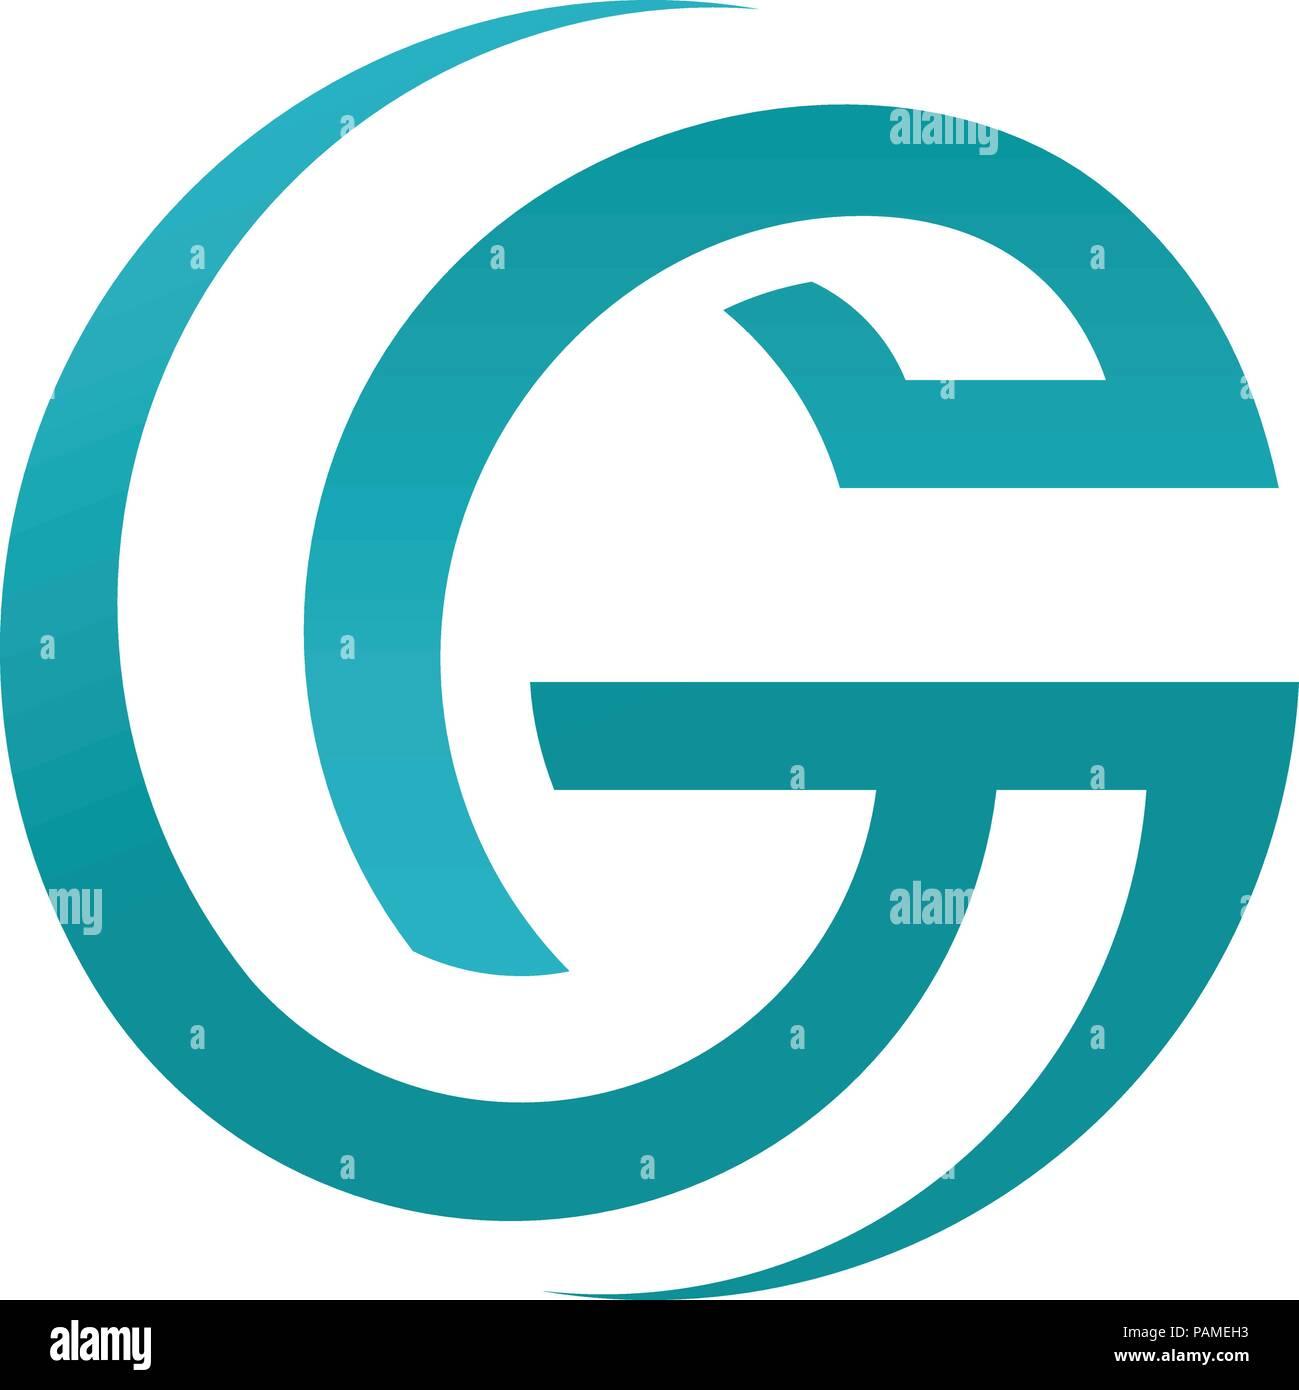 Best letter g concept business logo design template letter g circle best letter g concept business logo design template letter g circle style logo concept maxwellsz